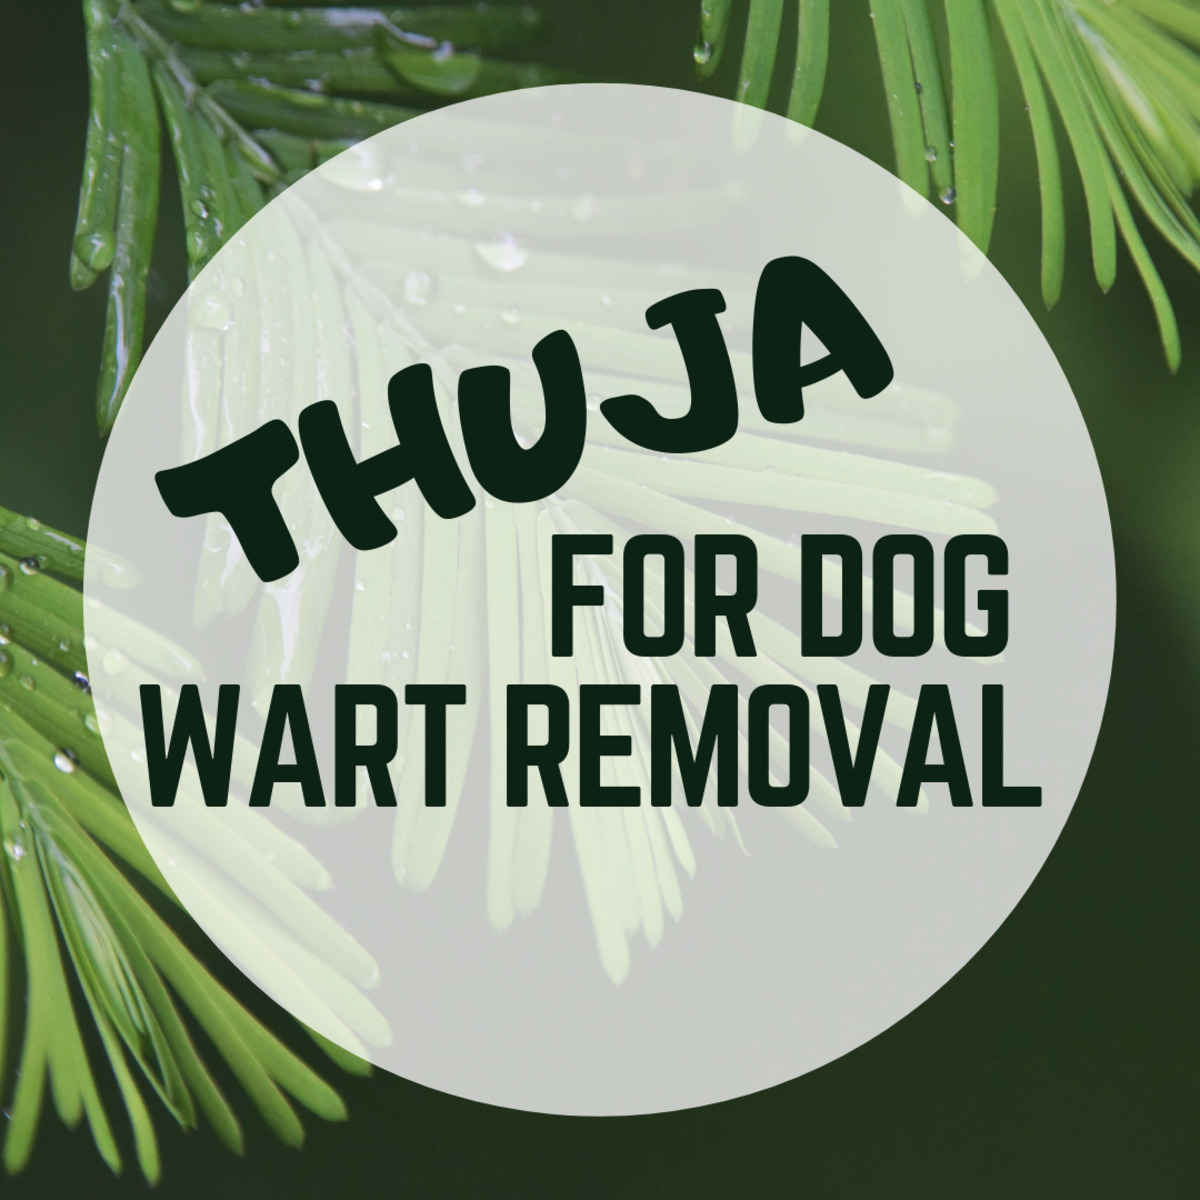 Dog Wart Removal Using Thuja